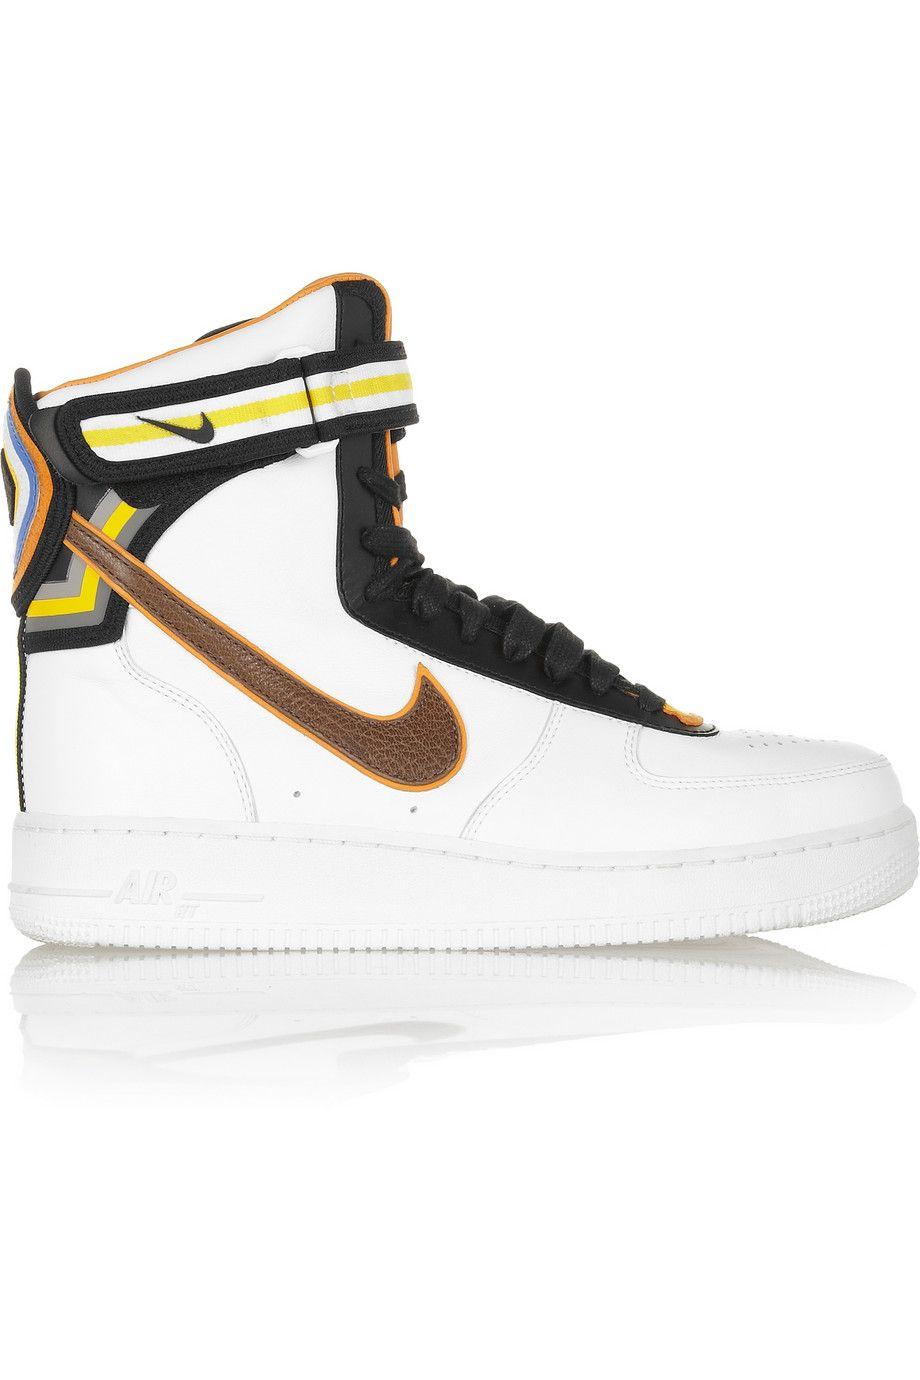 Nike | + Riccardo Tisci Air Force 1 leather hi-top sneakers | NET-